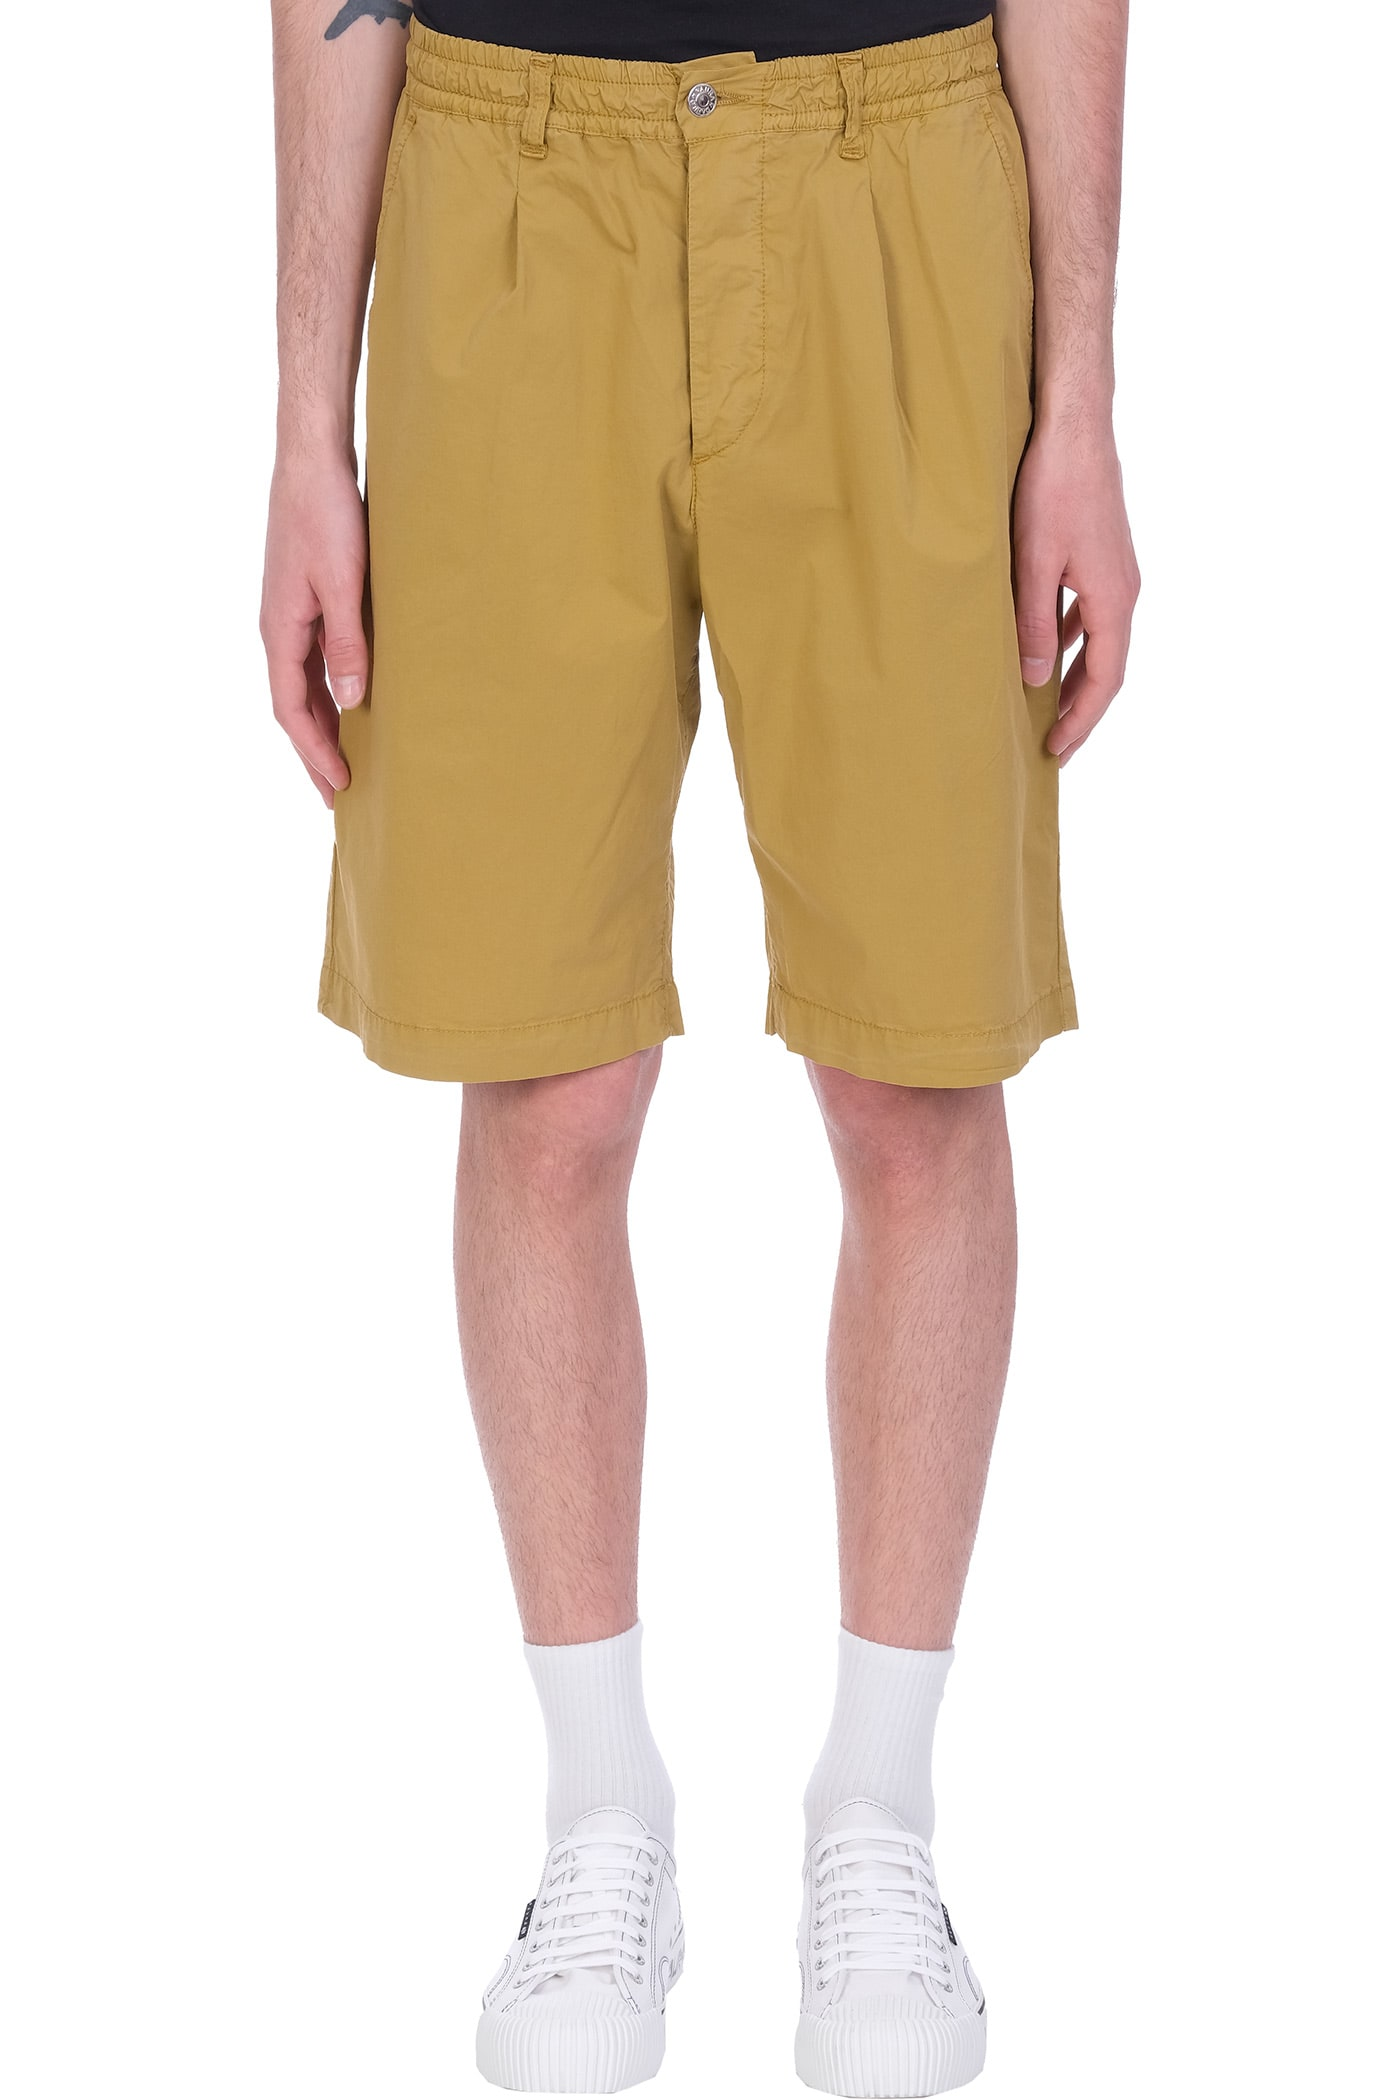 Danilo Paura Harrison Shorts In Beige Cotton